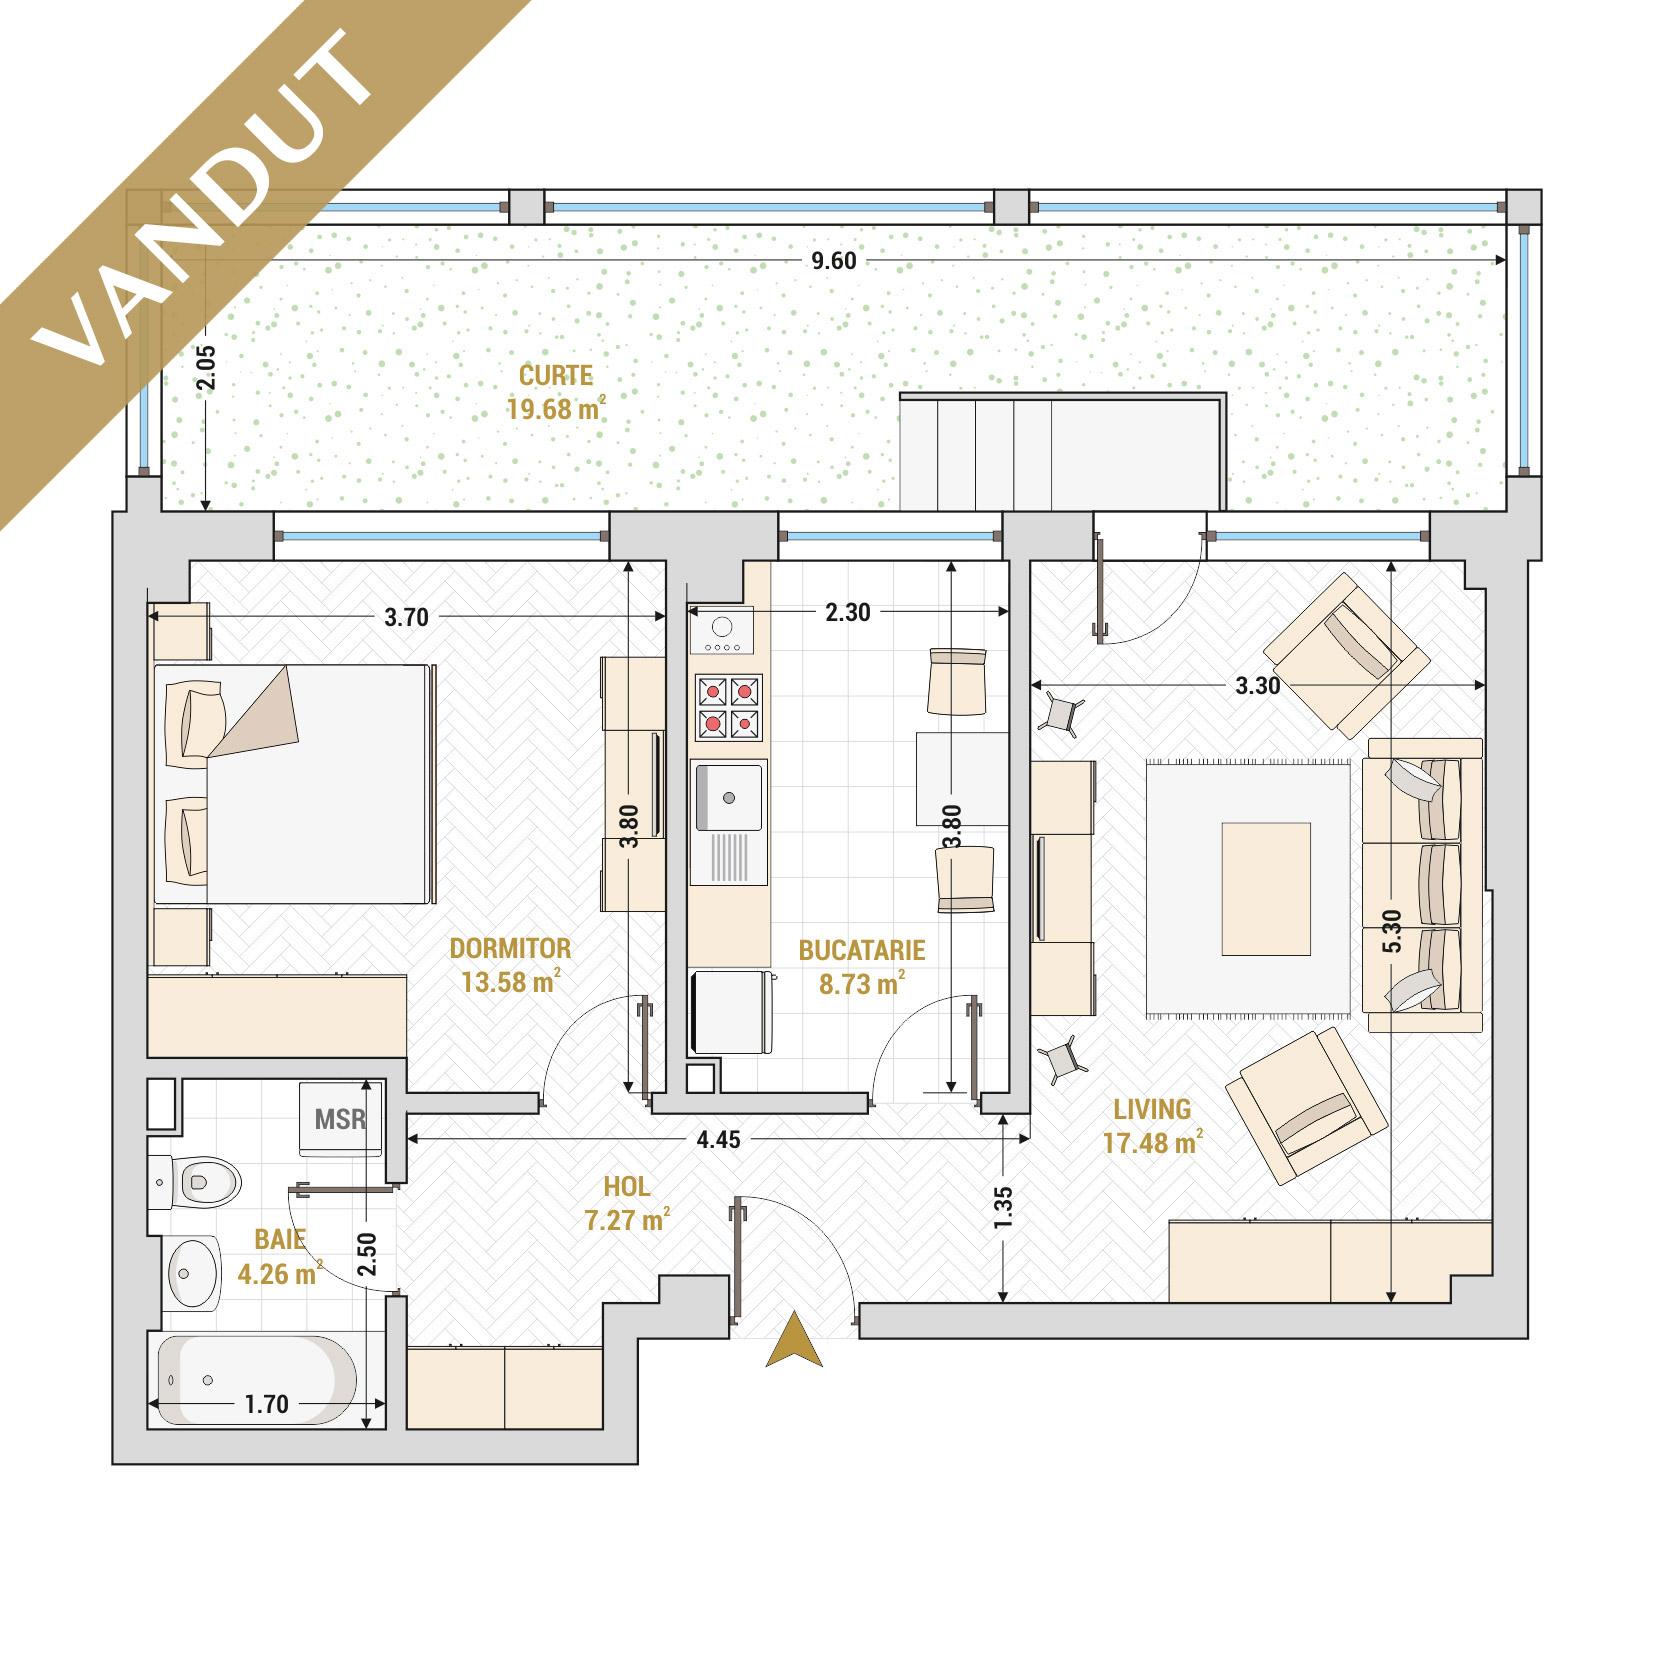 Apartament 2 camere de vanzare Bucuresti - Catedral Residence - Marriott, Piata Unirii, 13 Septembrie, Izvor - Tip 5 - T2 - V